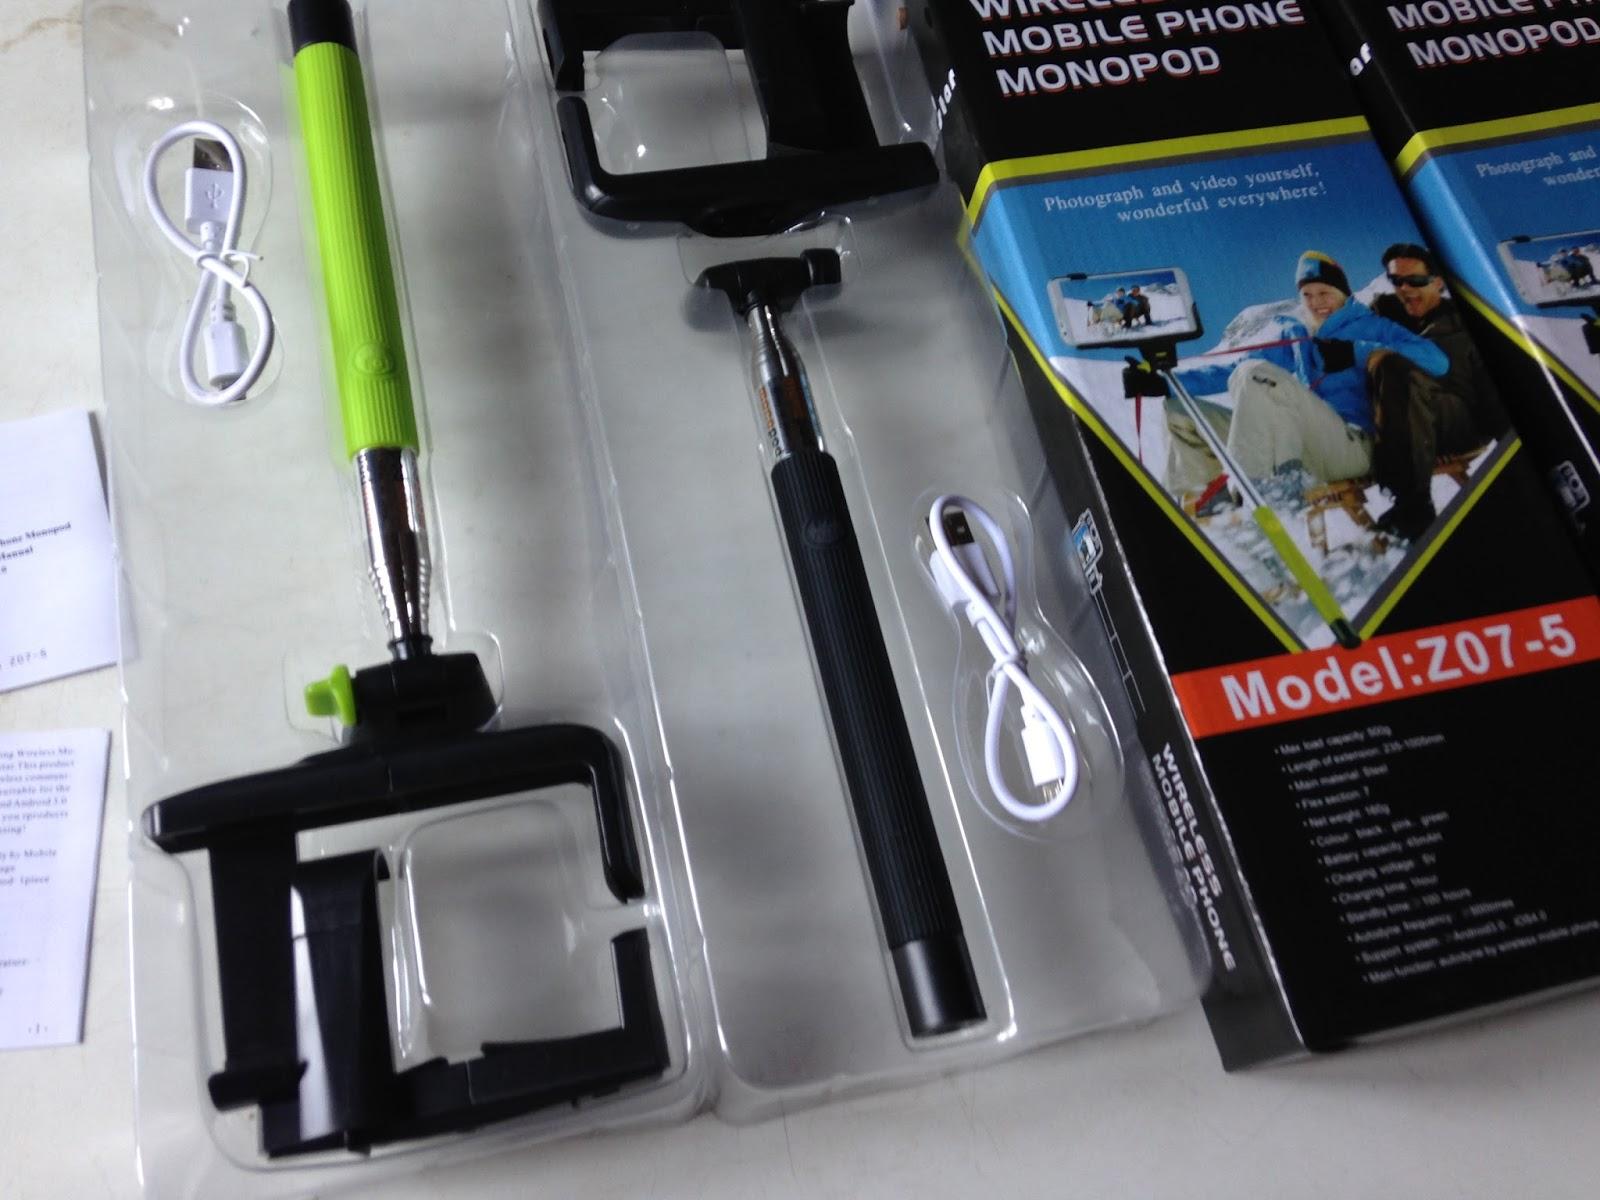 wireless mobile phone selfi stick in egypt. Black Bedroom Furniture Sets. Home Design Ideas